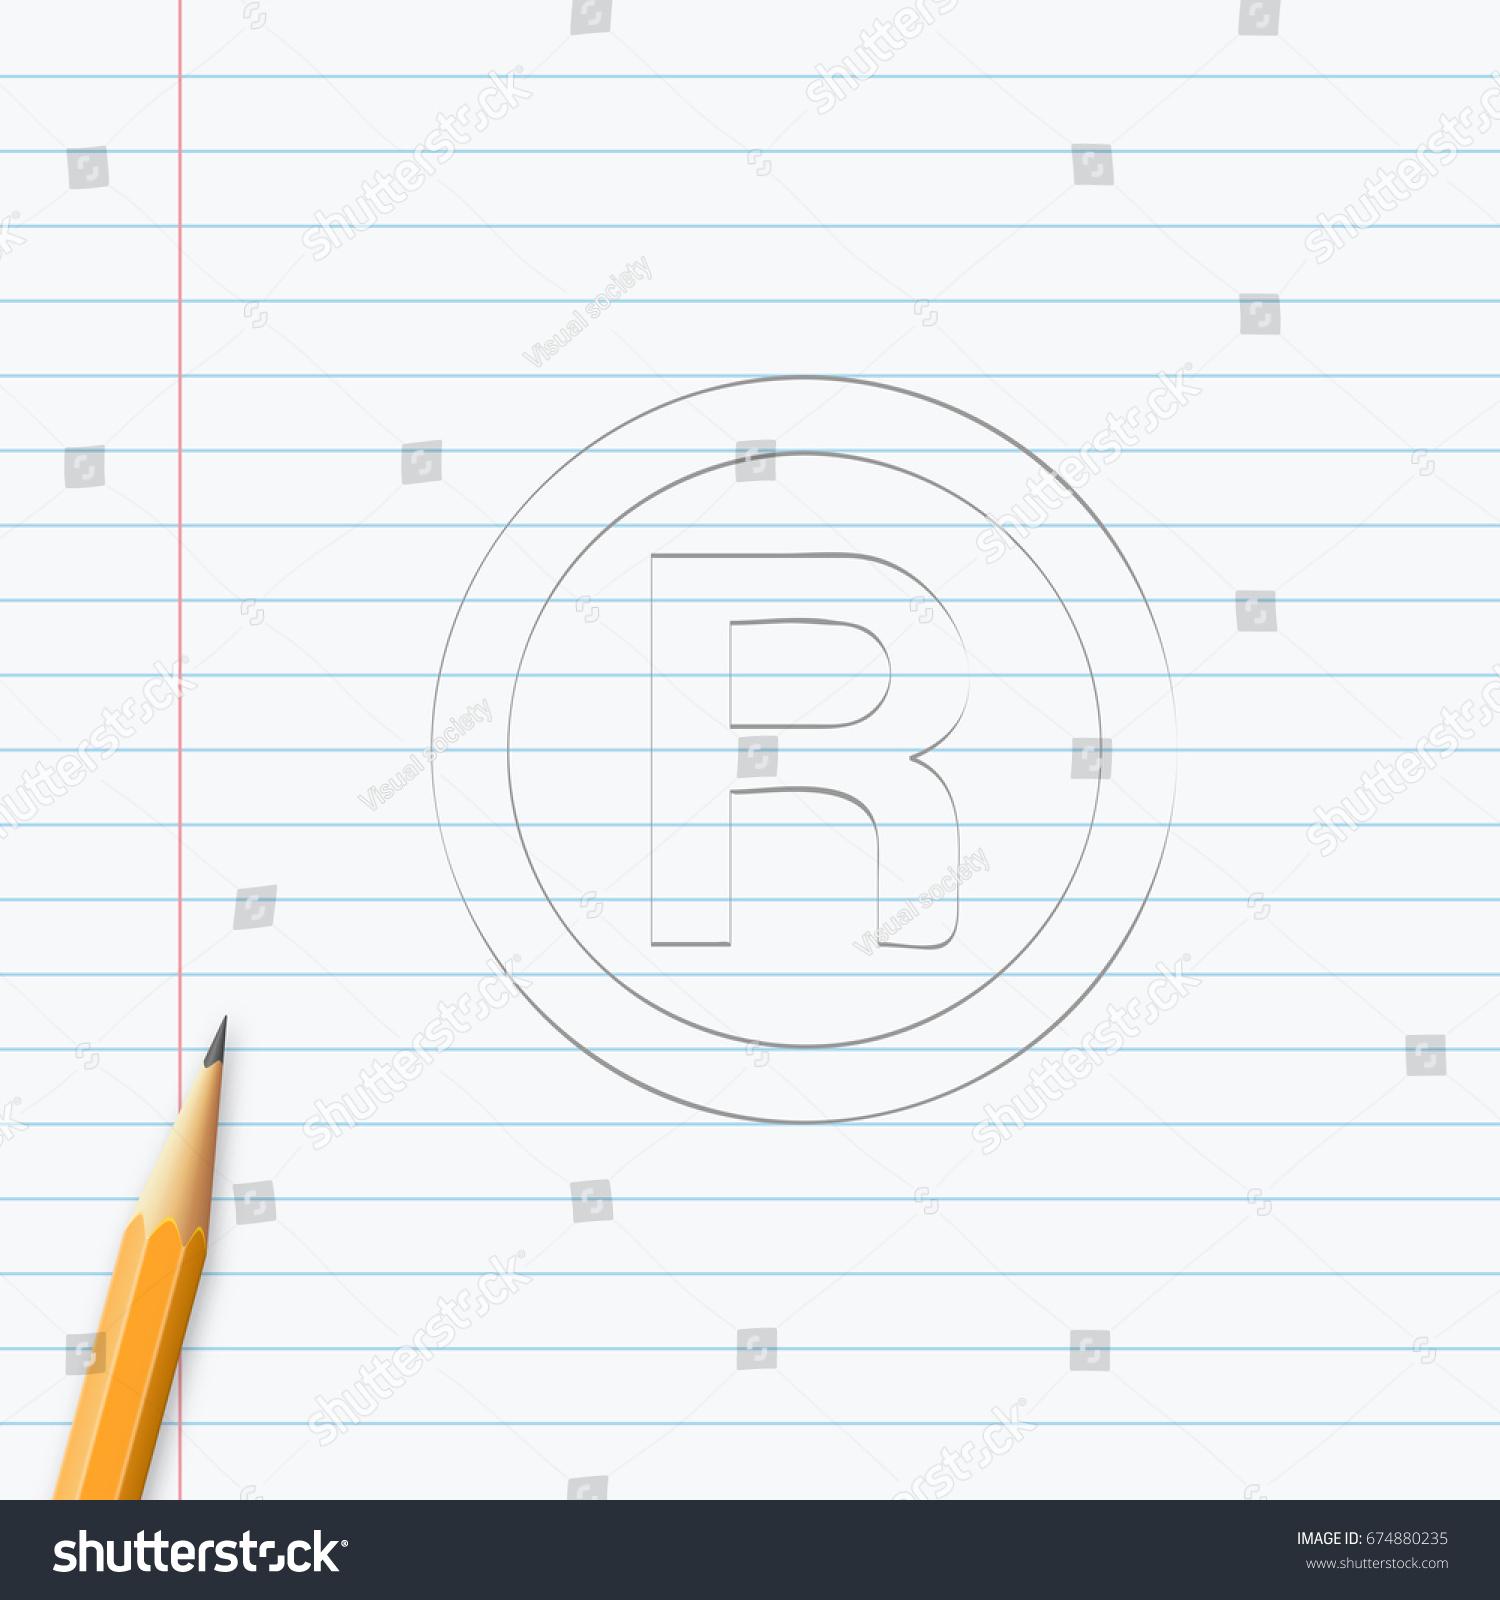 R registered trademark symbol hand drawn stock vector 674880235 r registered trademark symbol hand drawn with pencil on a paper sheet vector illustration biocorpaavc Gallery